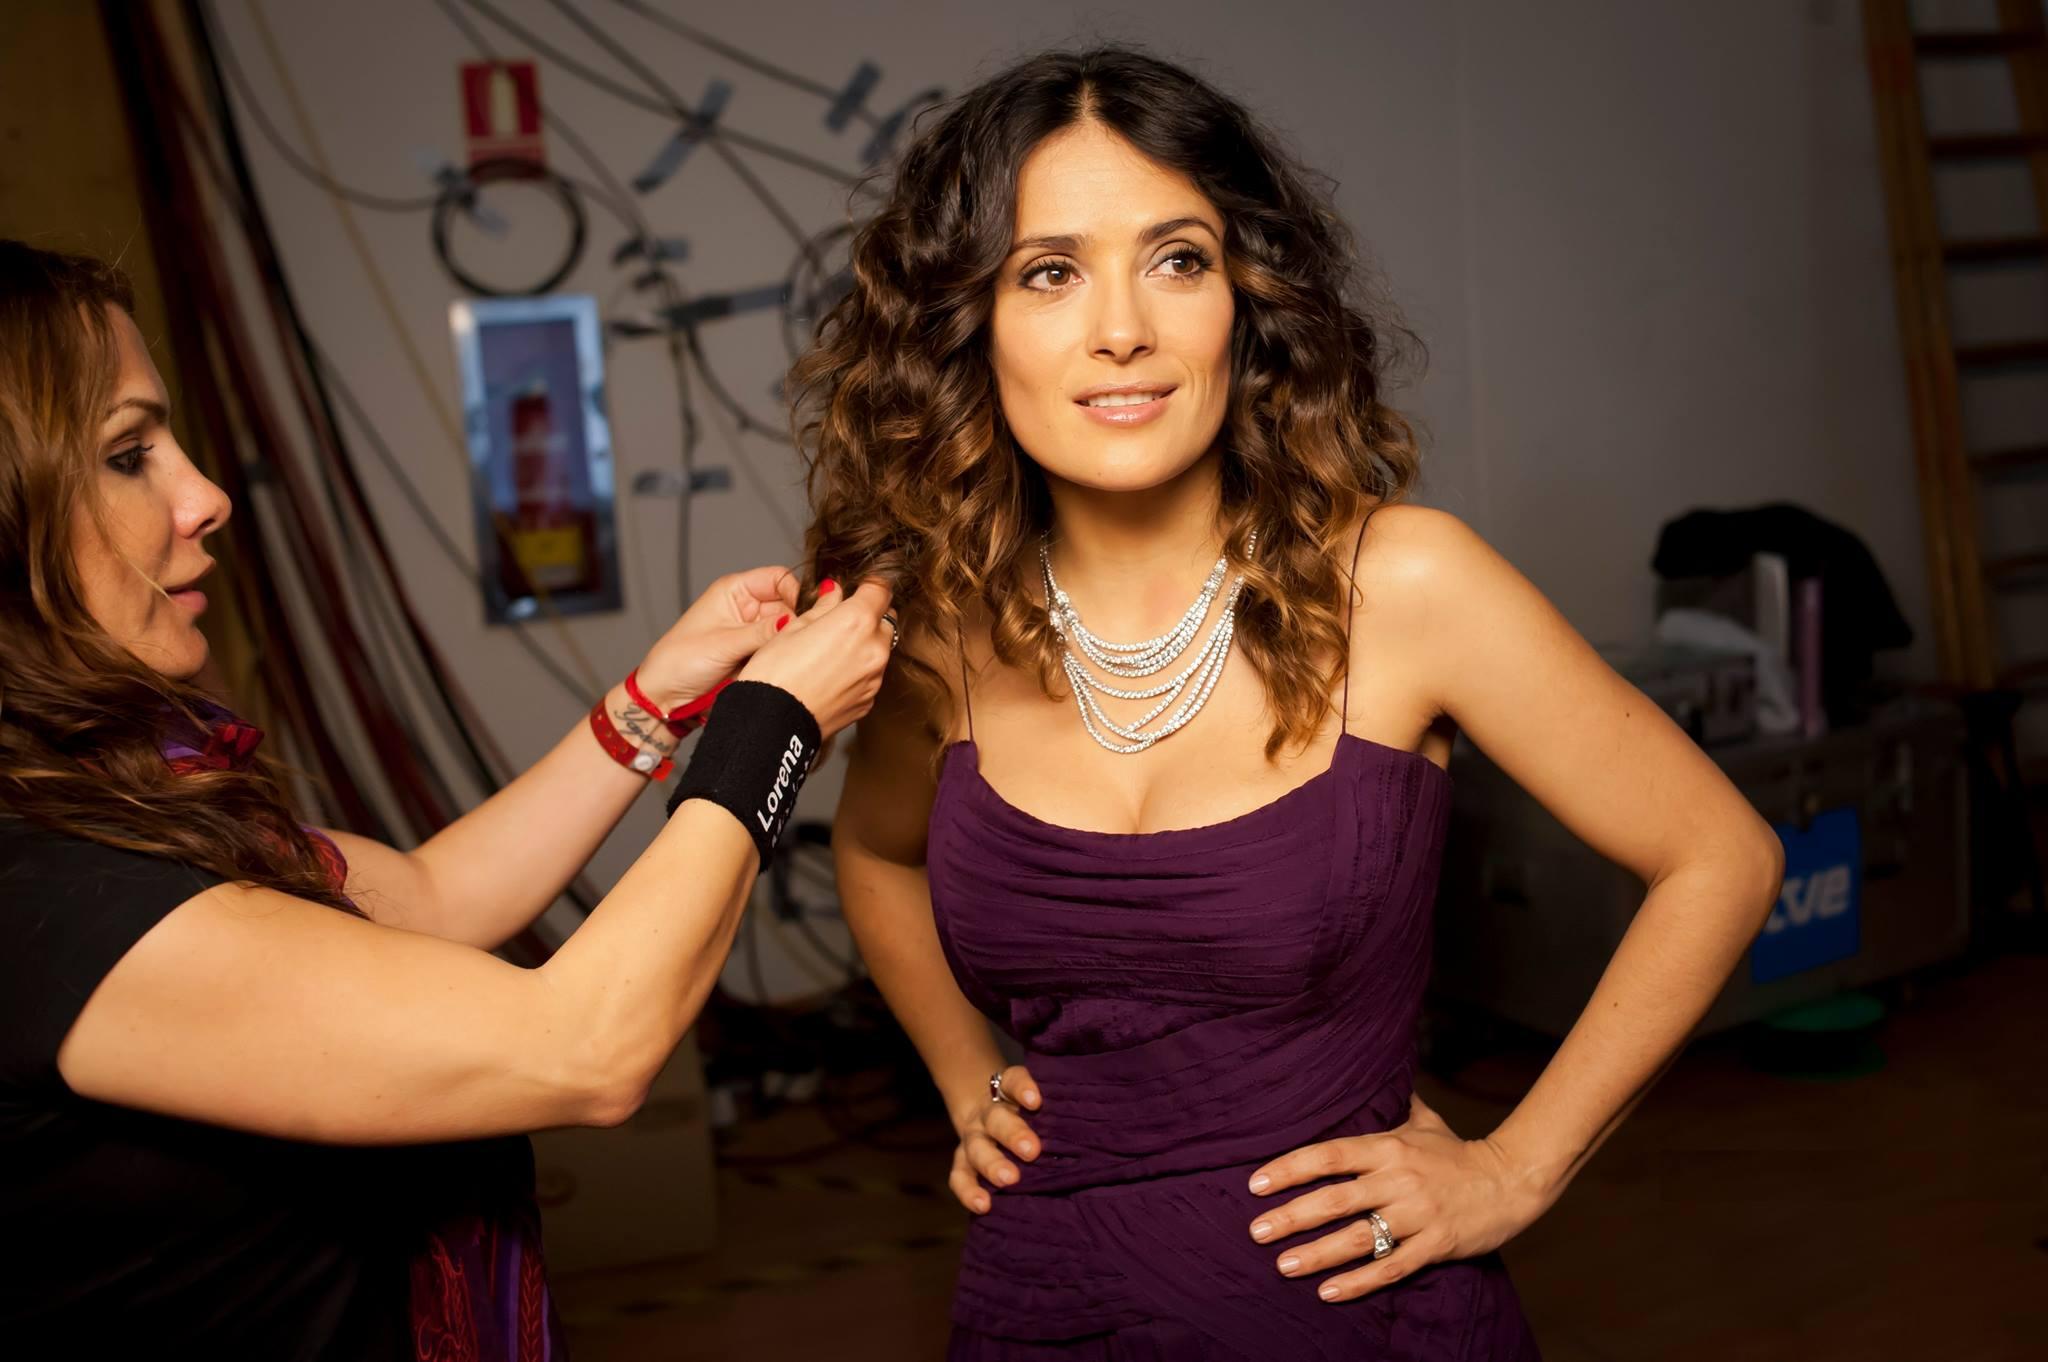 La mexicana Salma Hayek es otra de sus clientes